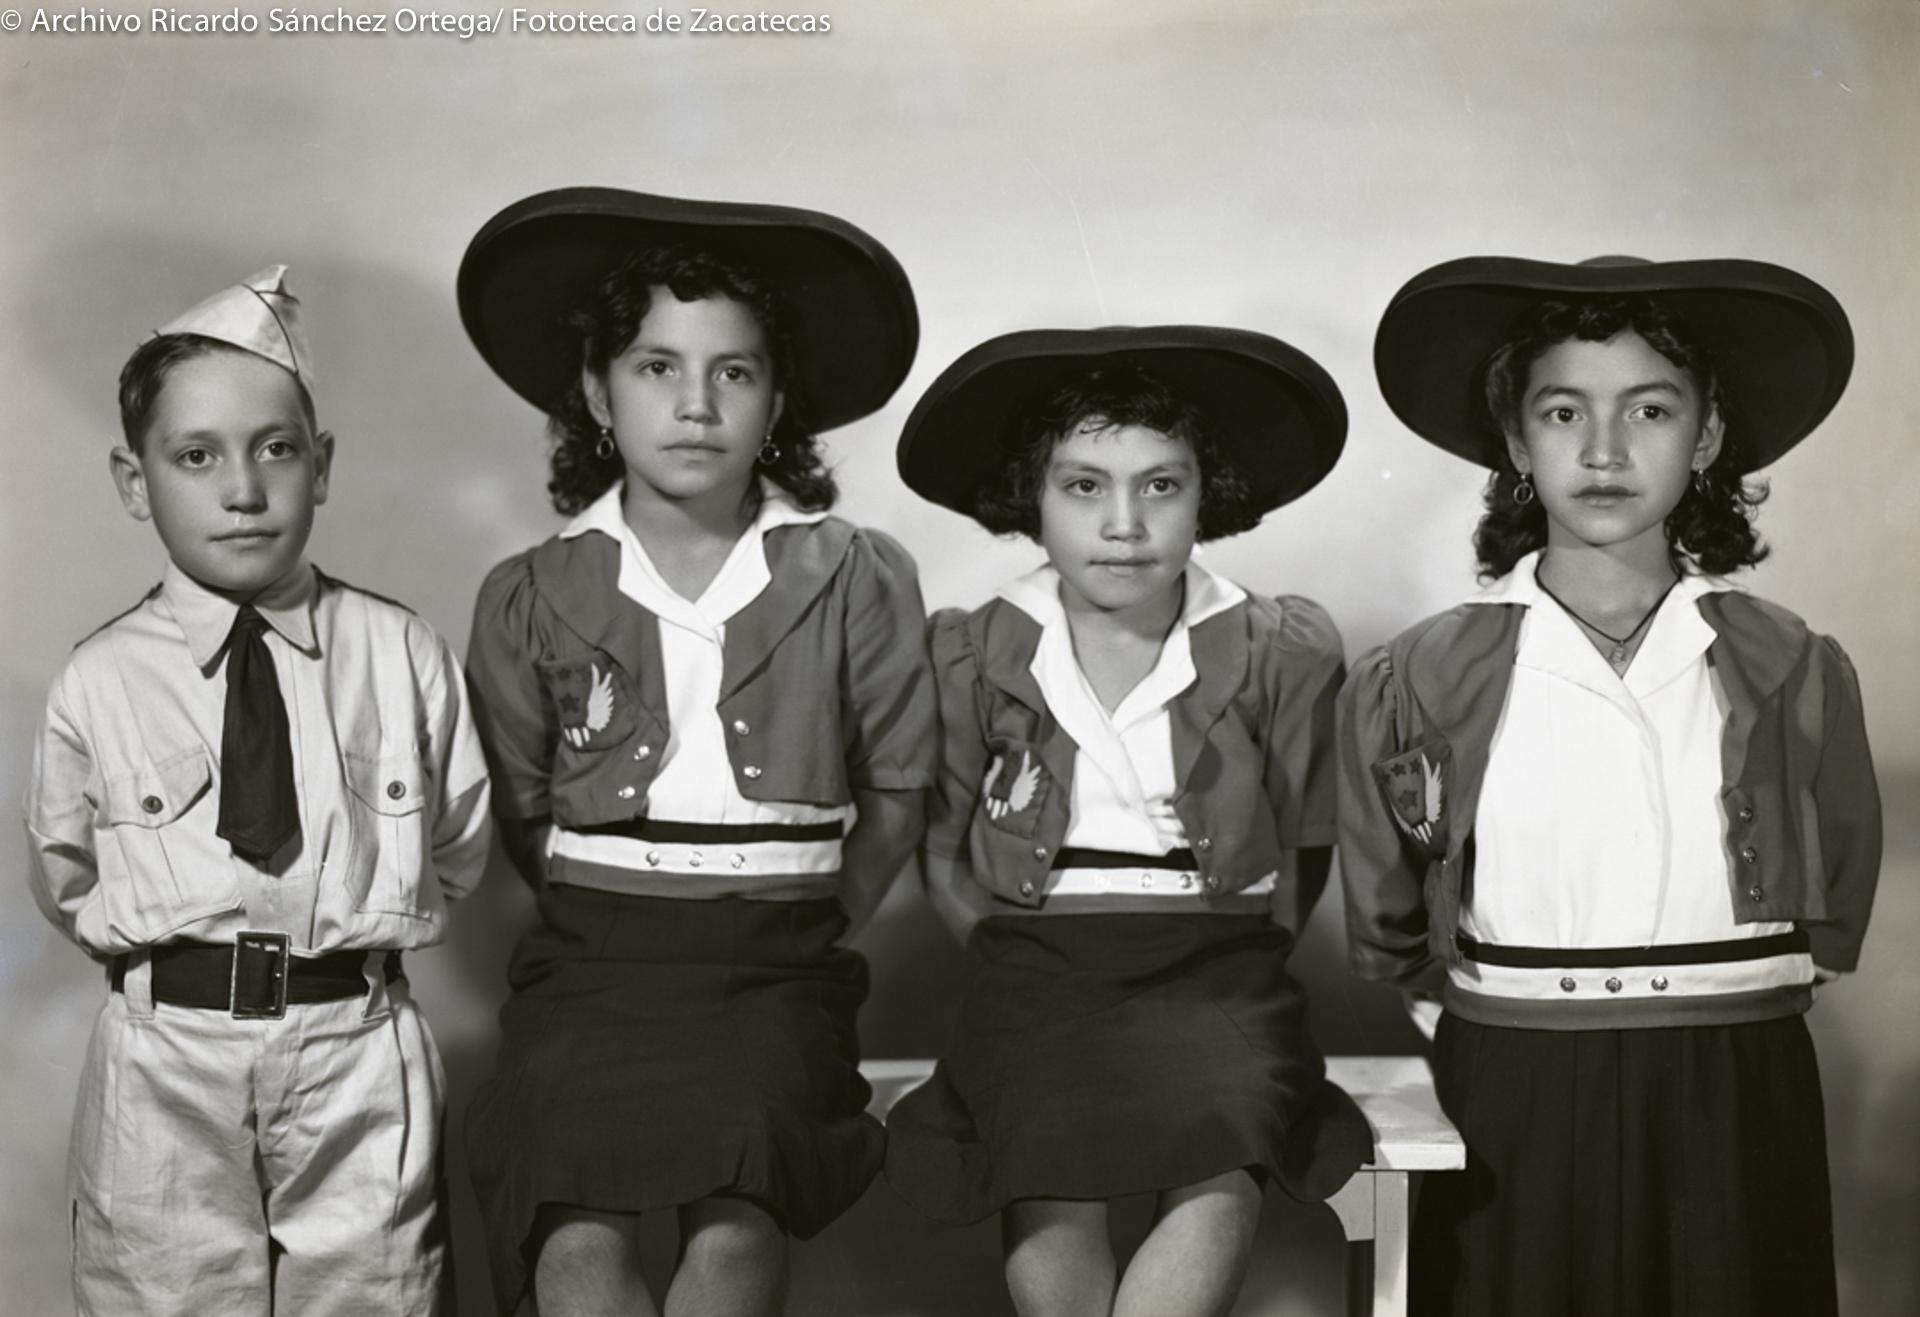 © Archivo Ricardo Sánchez Ortega/ Fototeca de Zacatecas